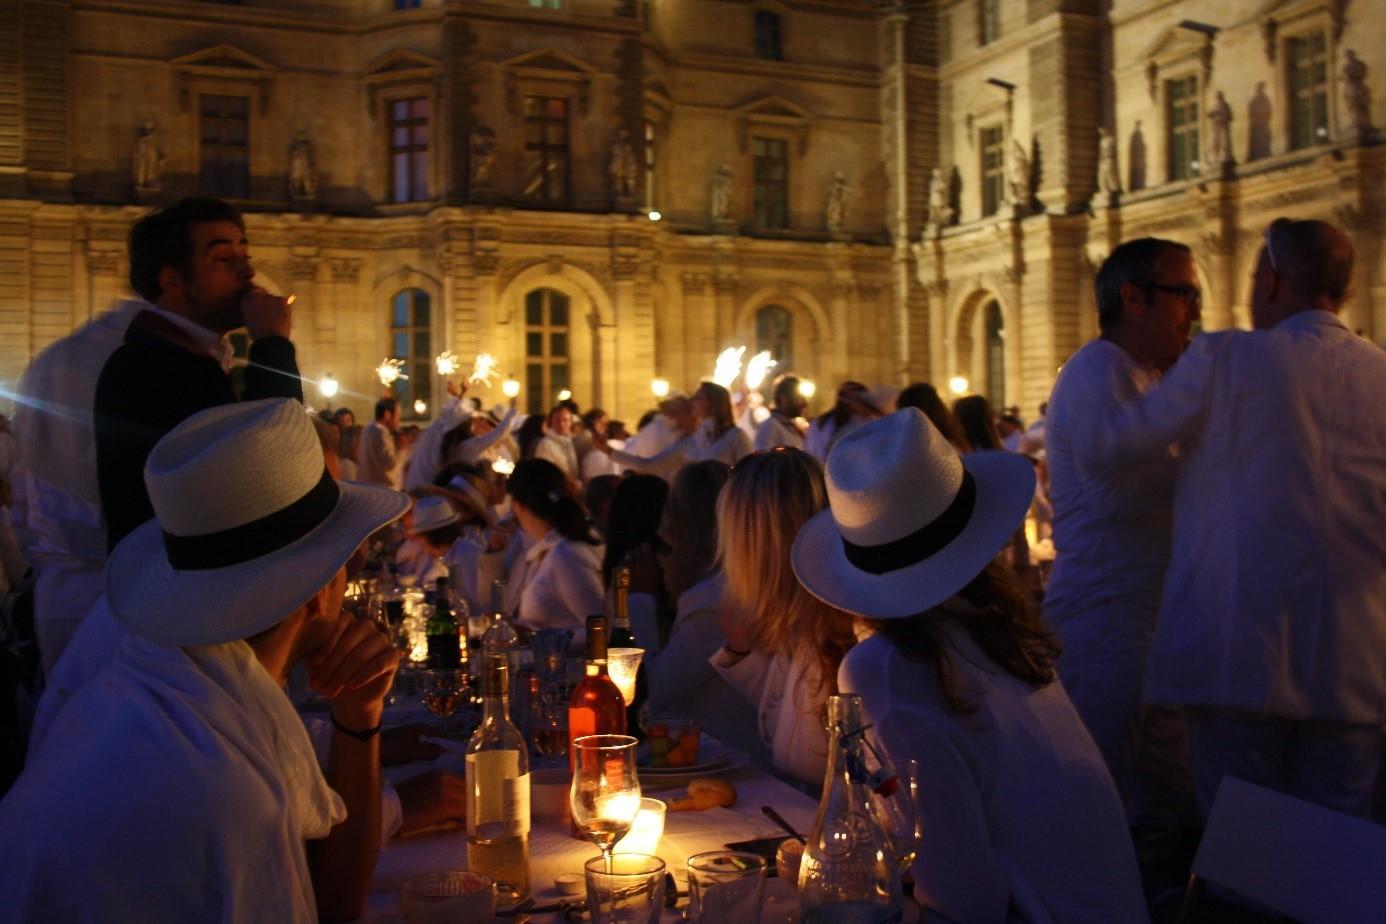 Dinner en blanc im Innenhof Louvre 2013,  https://www.flickr.com/photos/parisharing/9035909927/